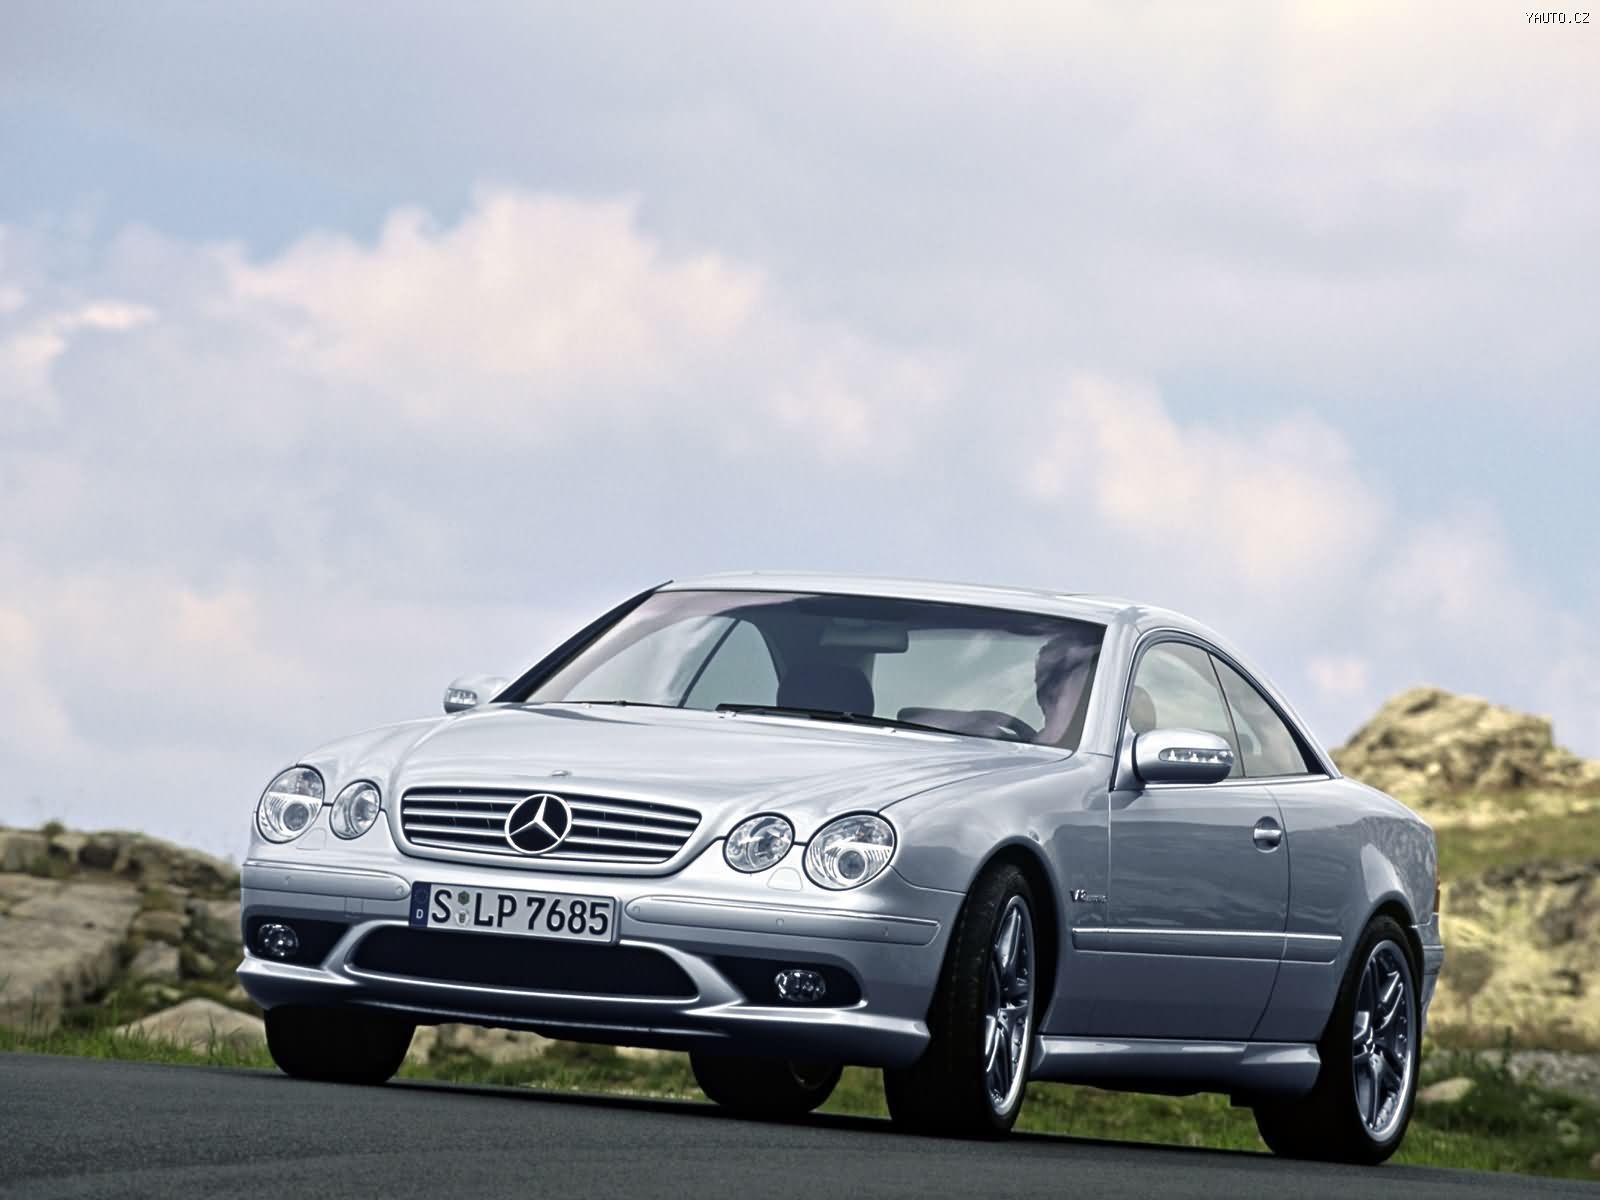 Mercedes benz cl65 amg 2003 auta na plochu tapety na for Mercedes benz cl65